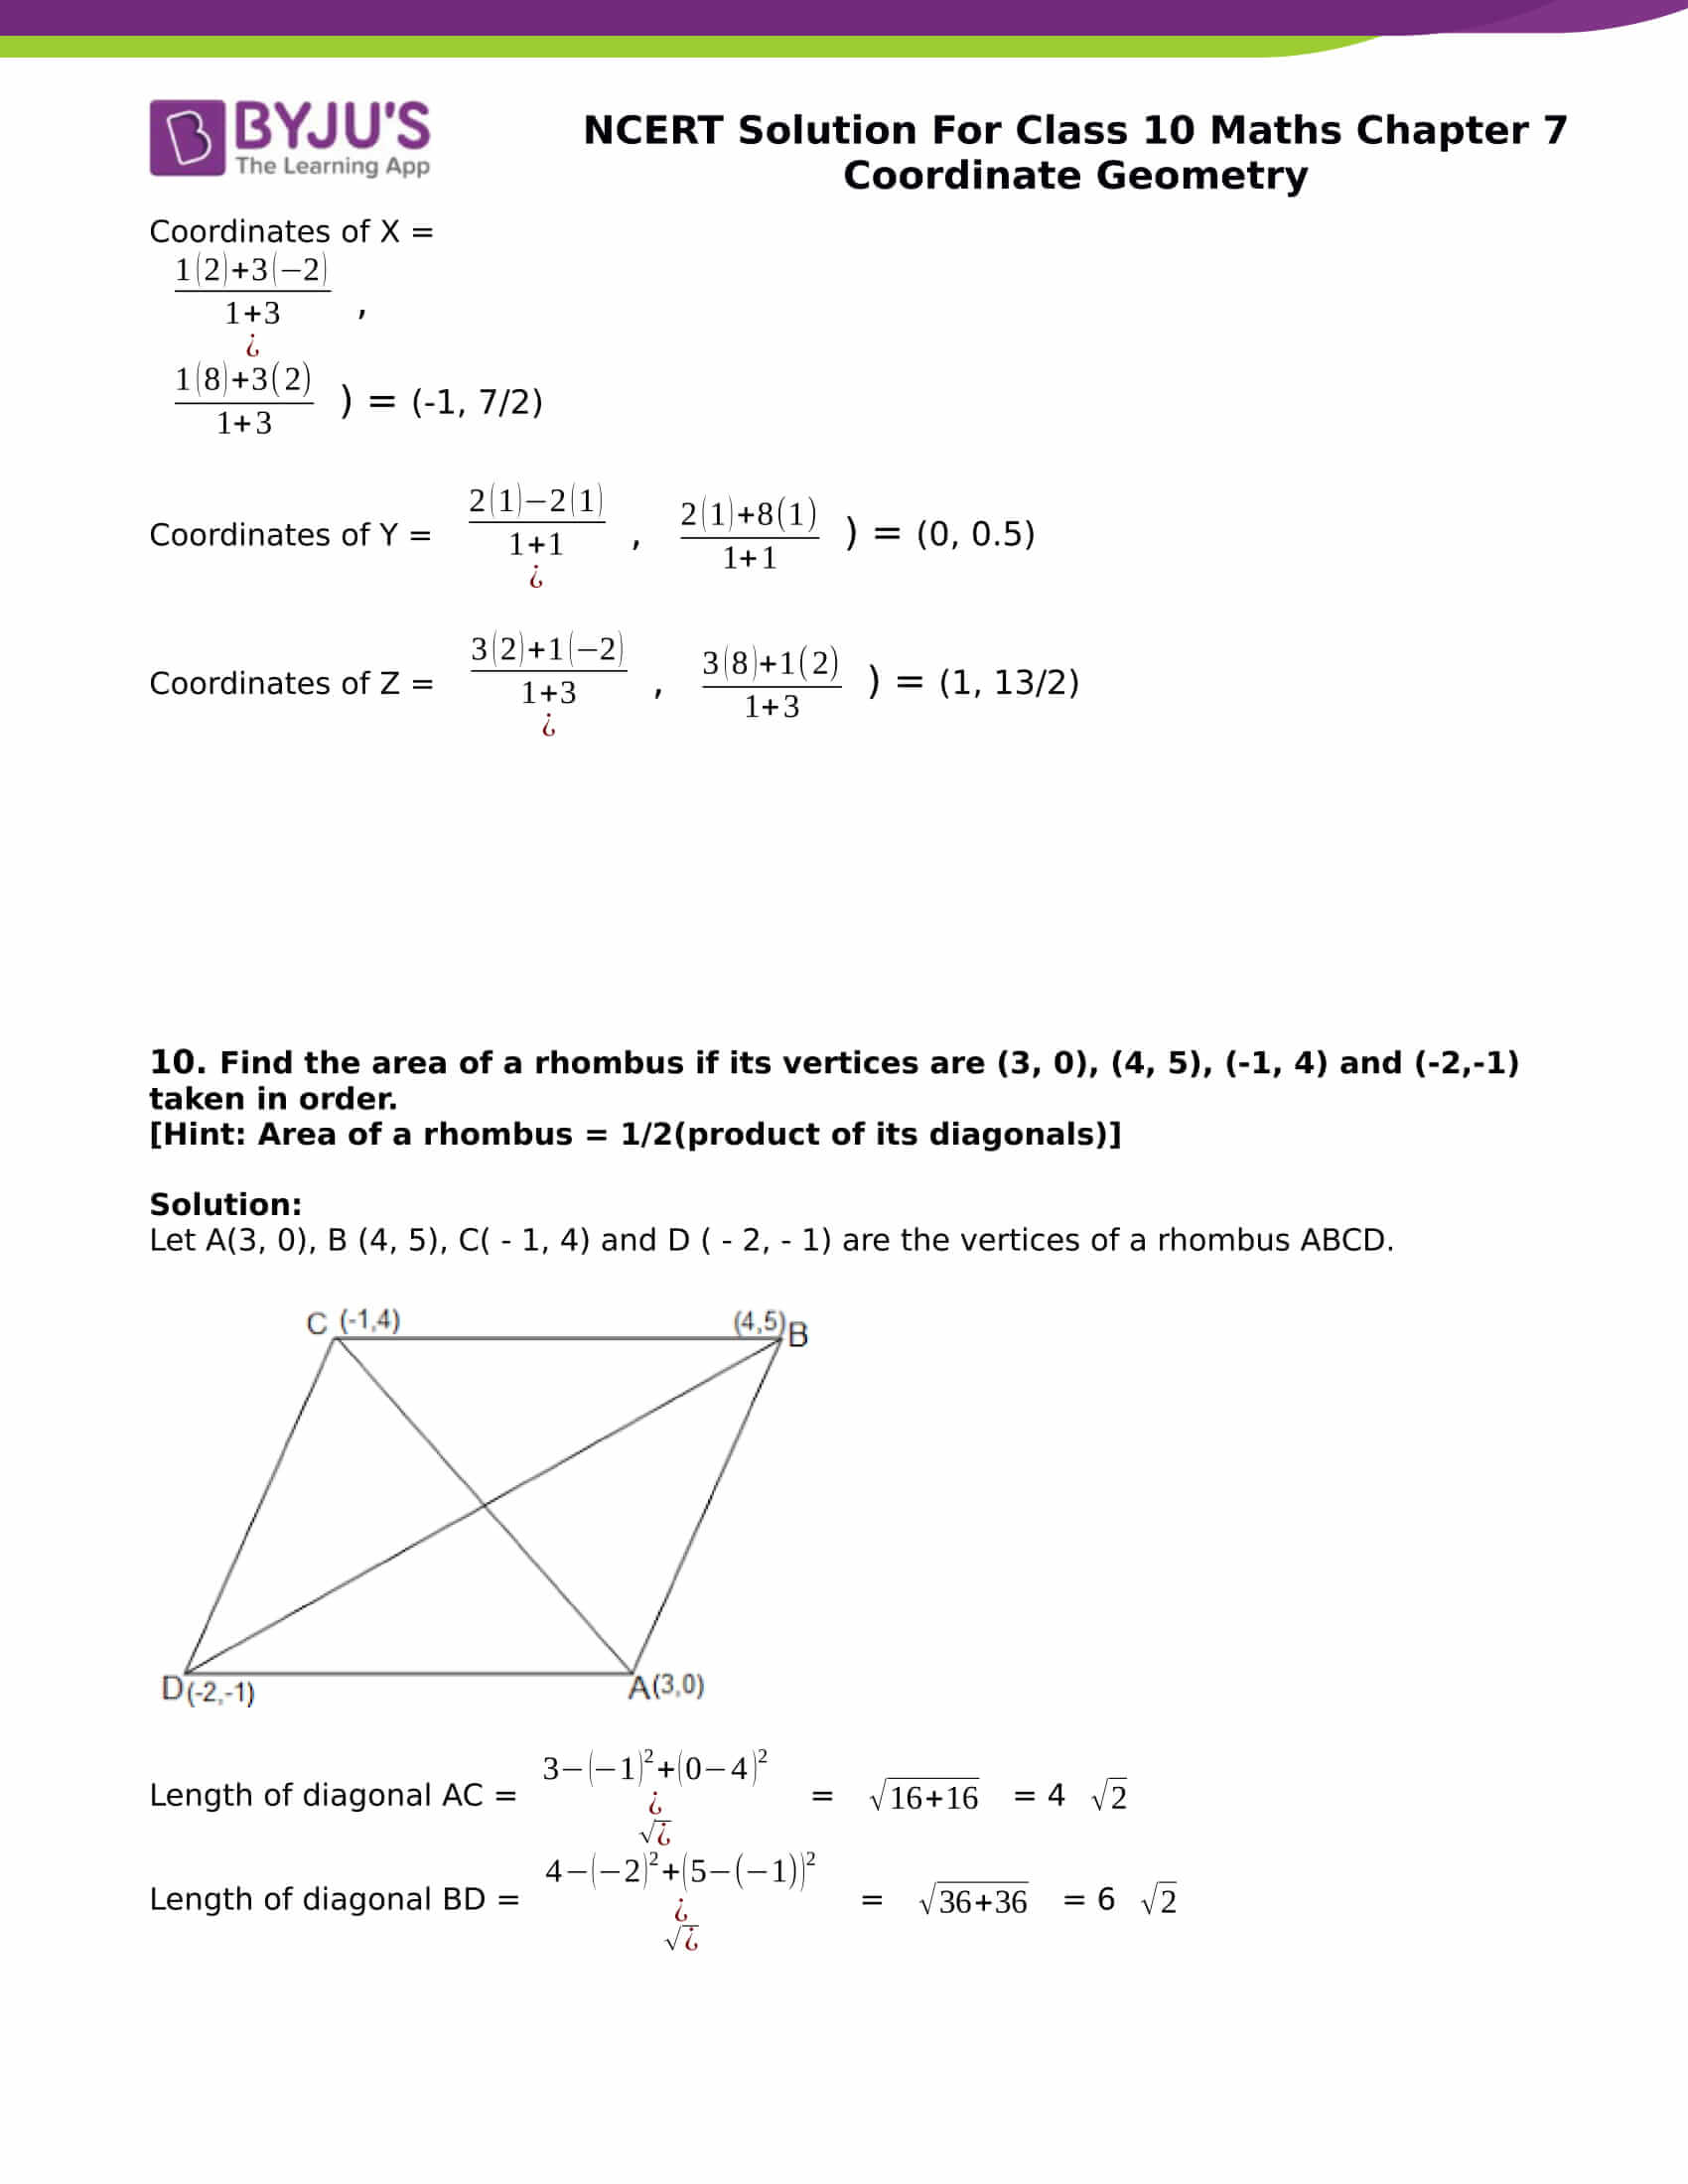 NCERT Solution for class 10 Maths chapter 7 Coordinate Geometry Part 16